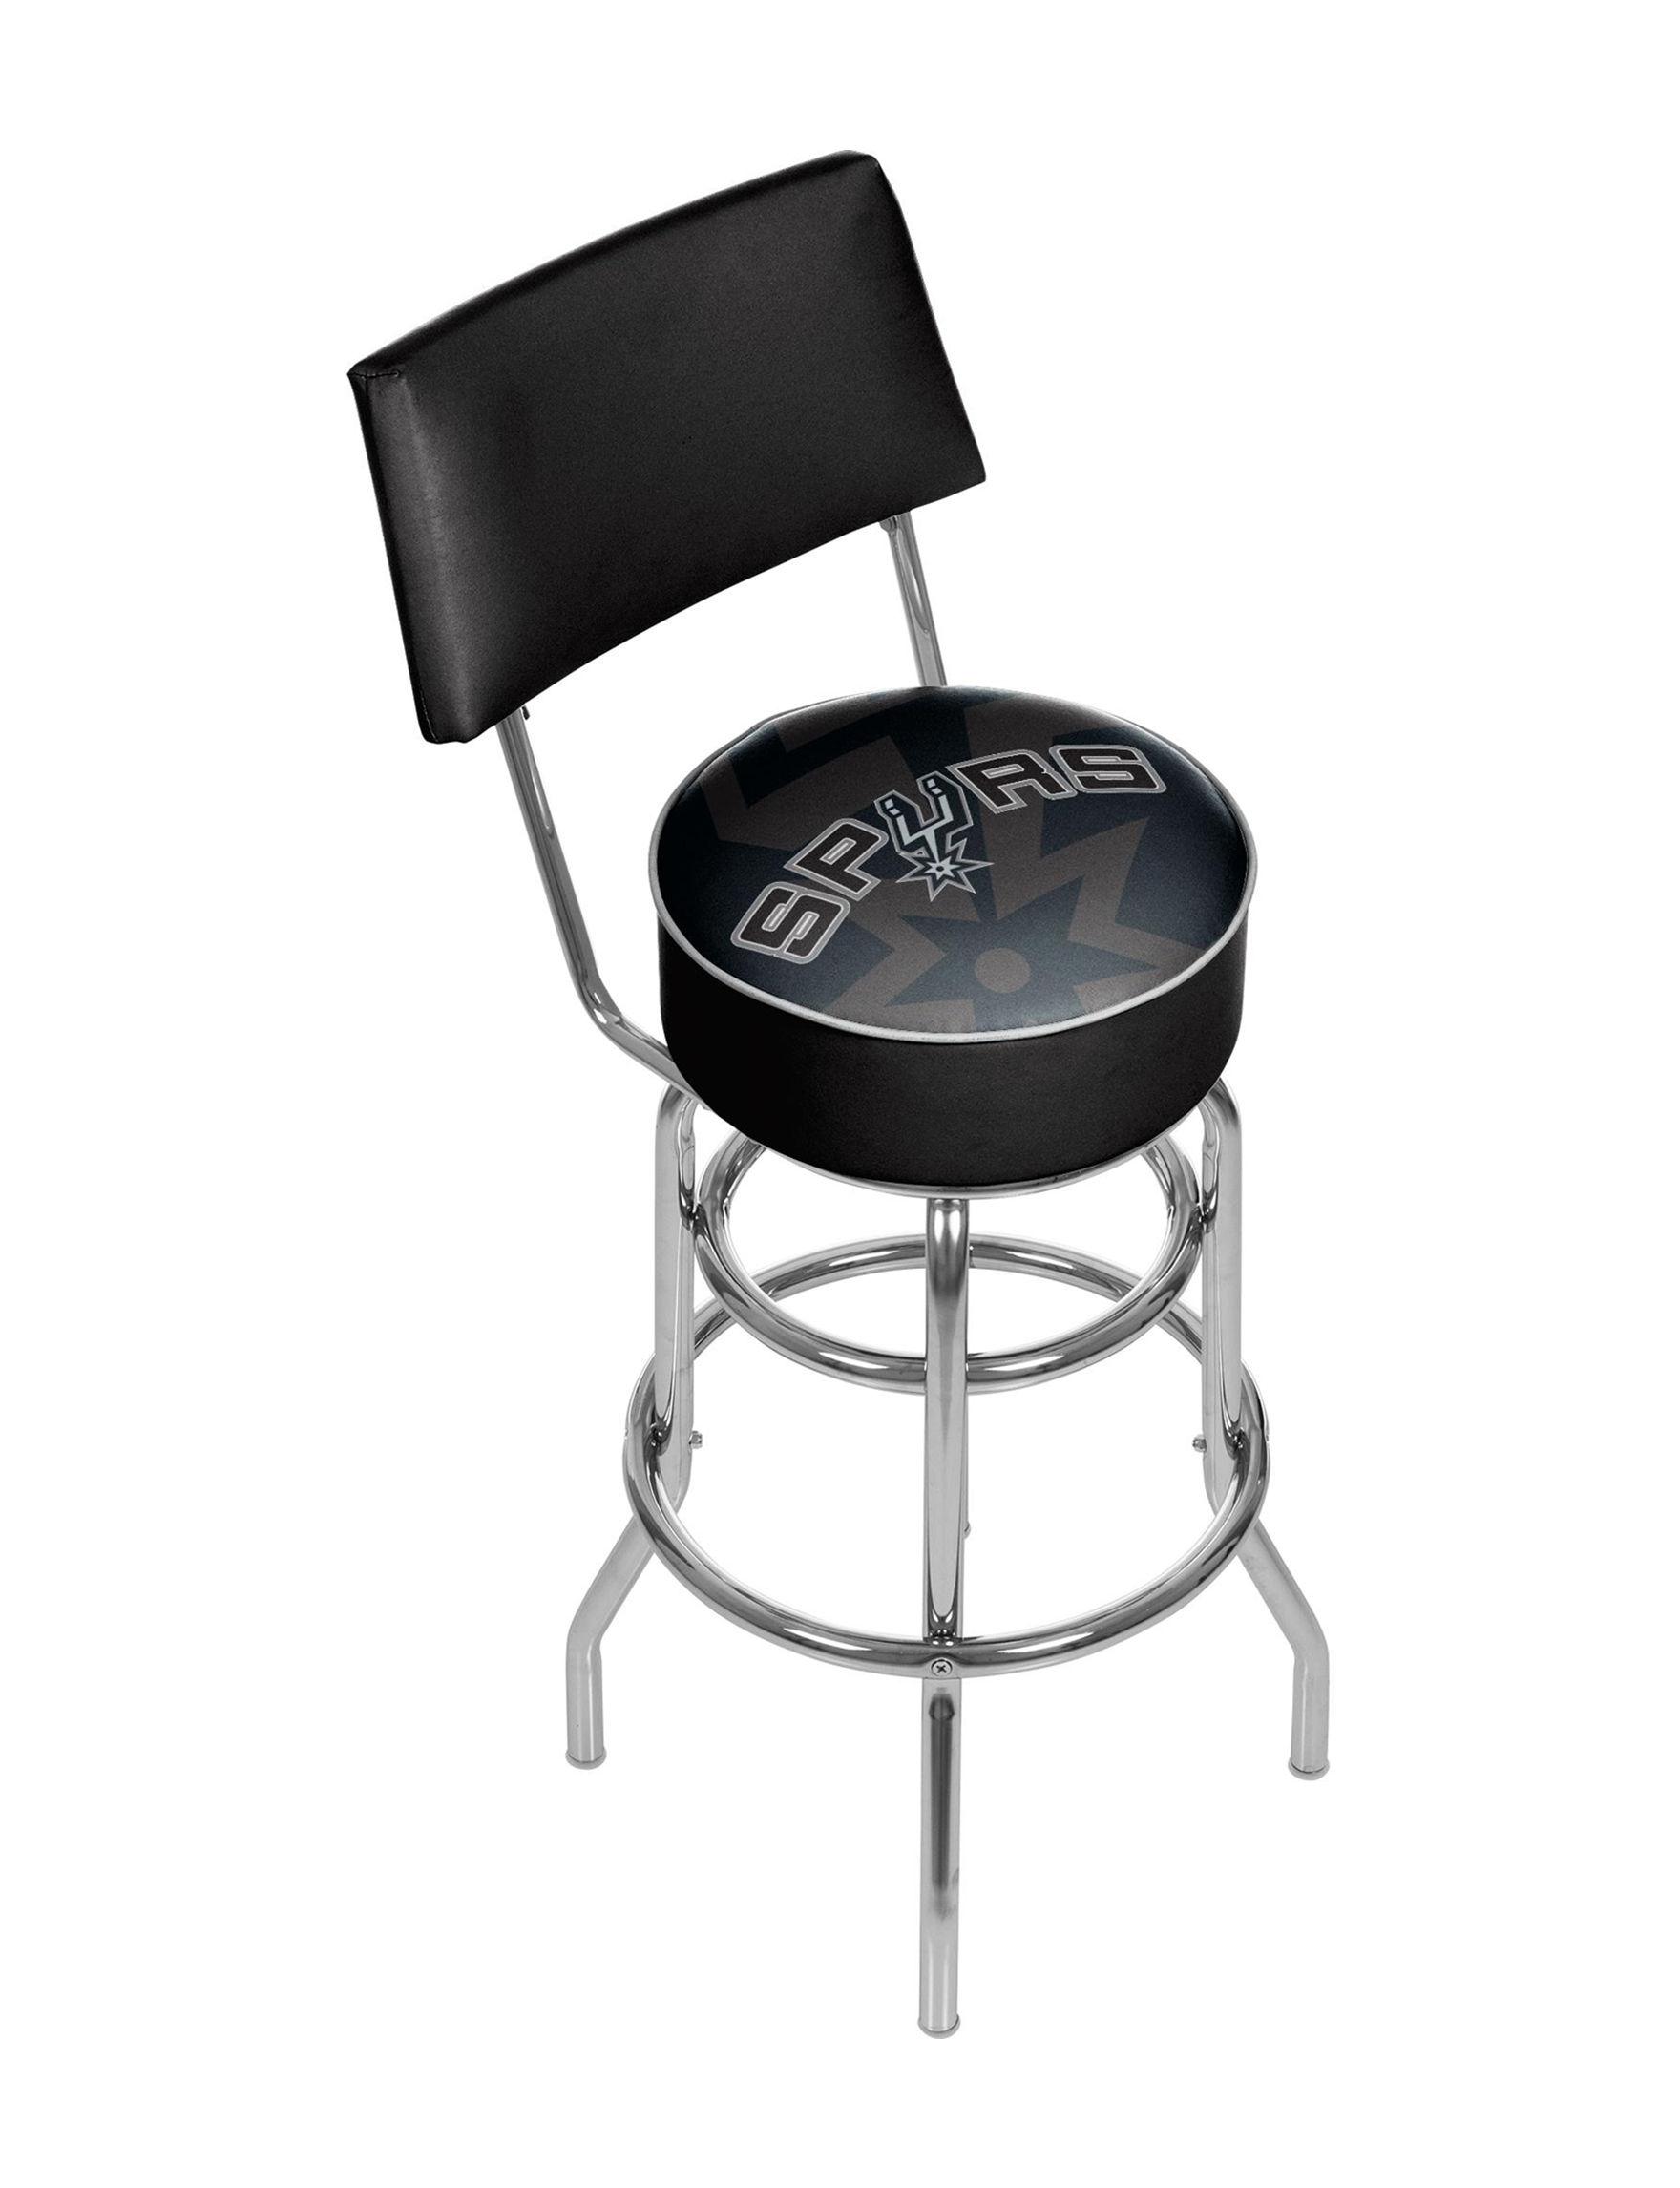 Trademark Global Black / Silver Bar & Kitchen Stools Game Room Kitchen & Dining Furniture